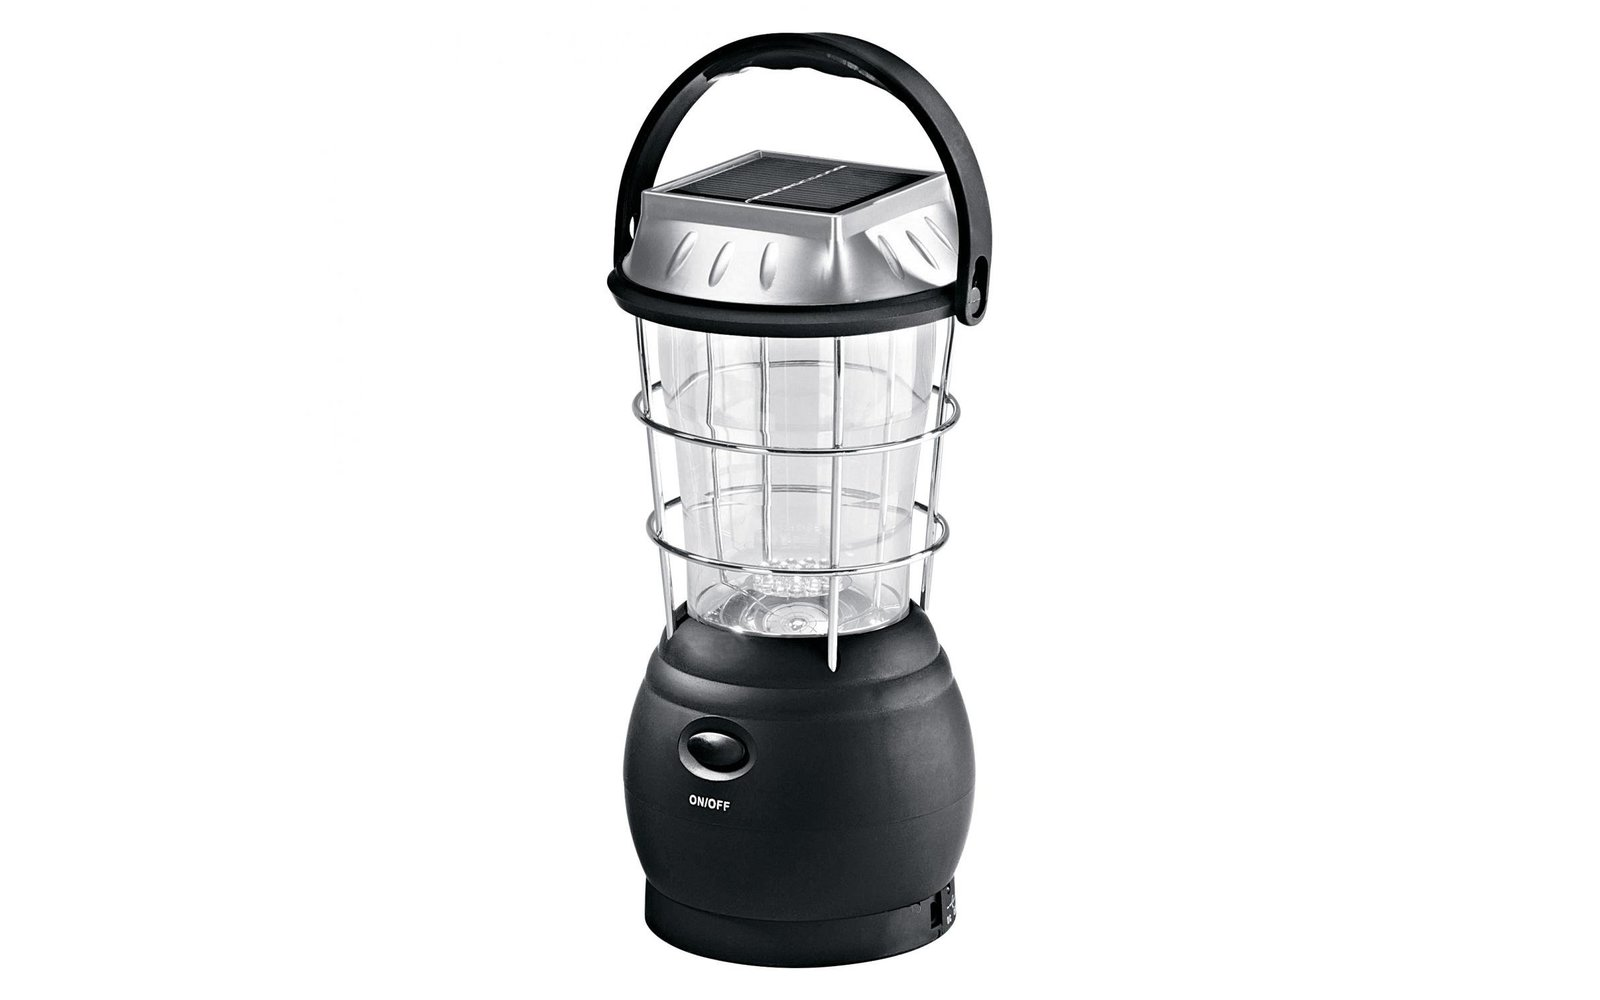 Tassimo Entkalkt Lampe Leuchtet Immer Noch